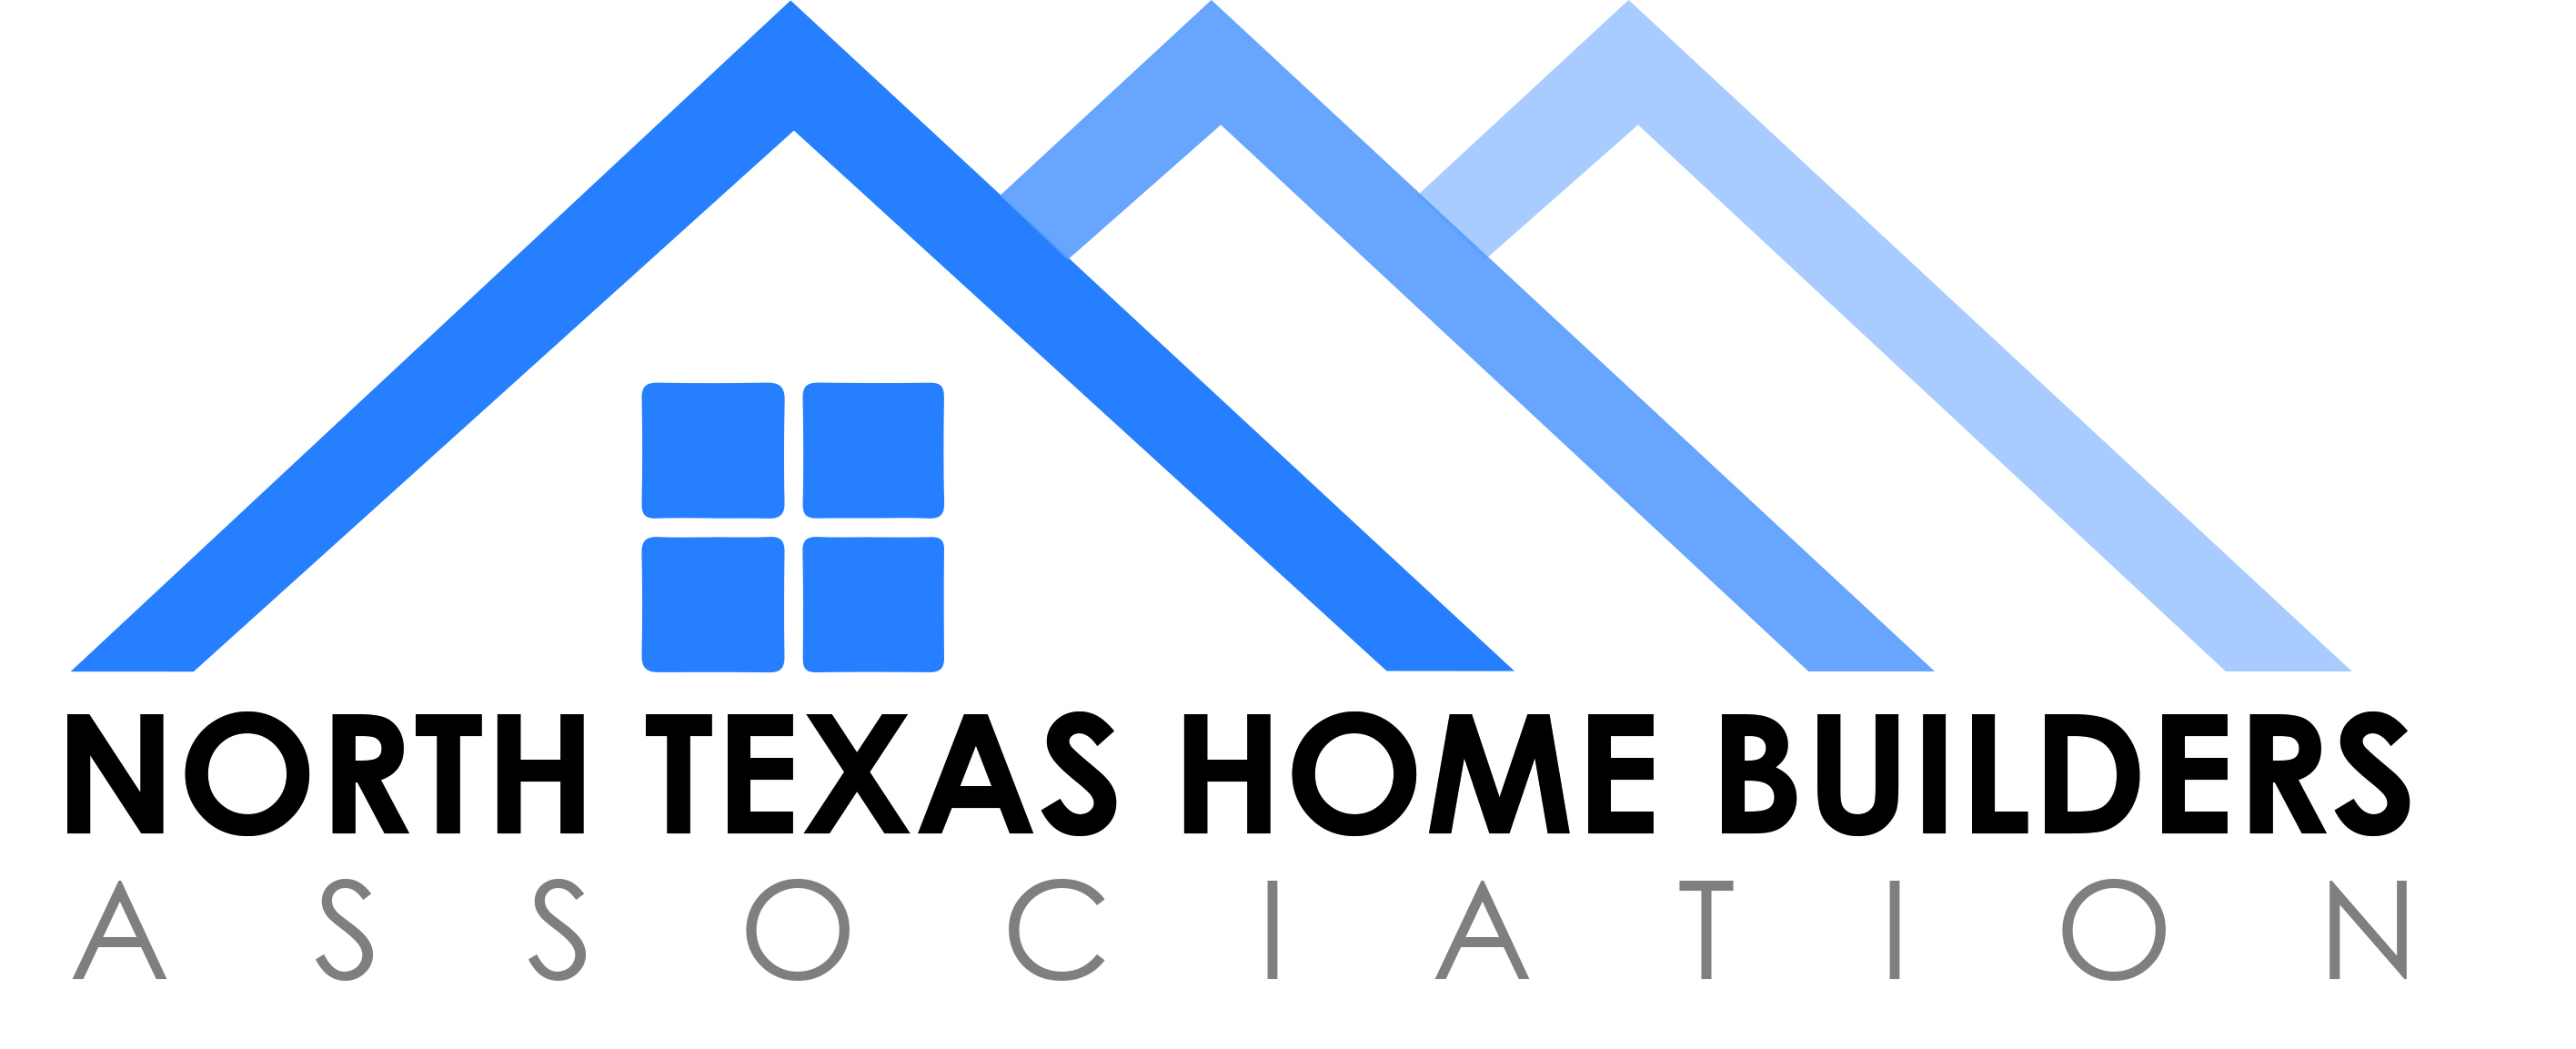 North Texas Home Builders Association